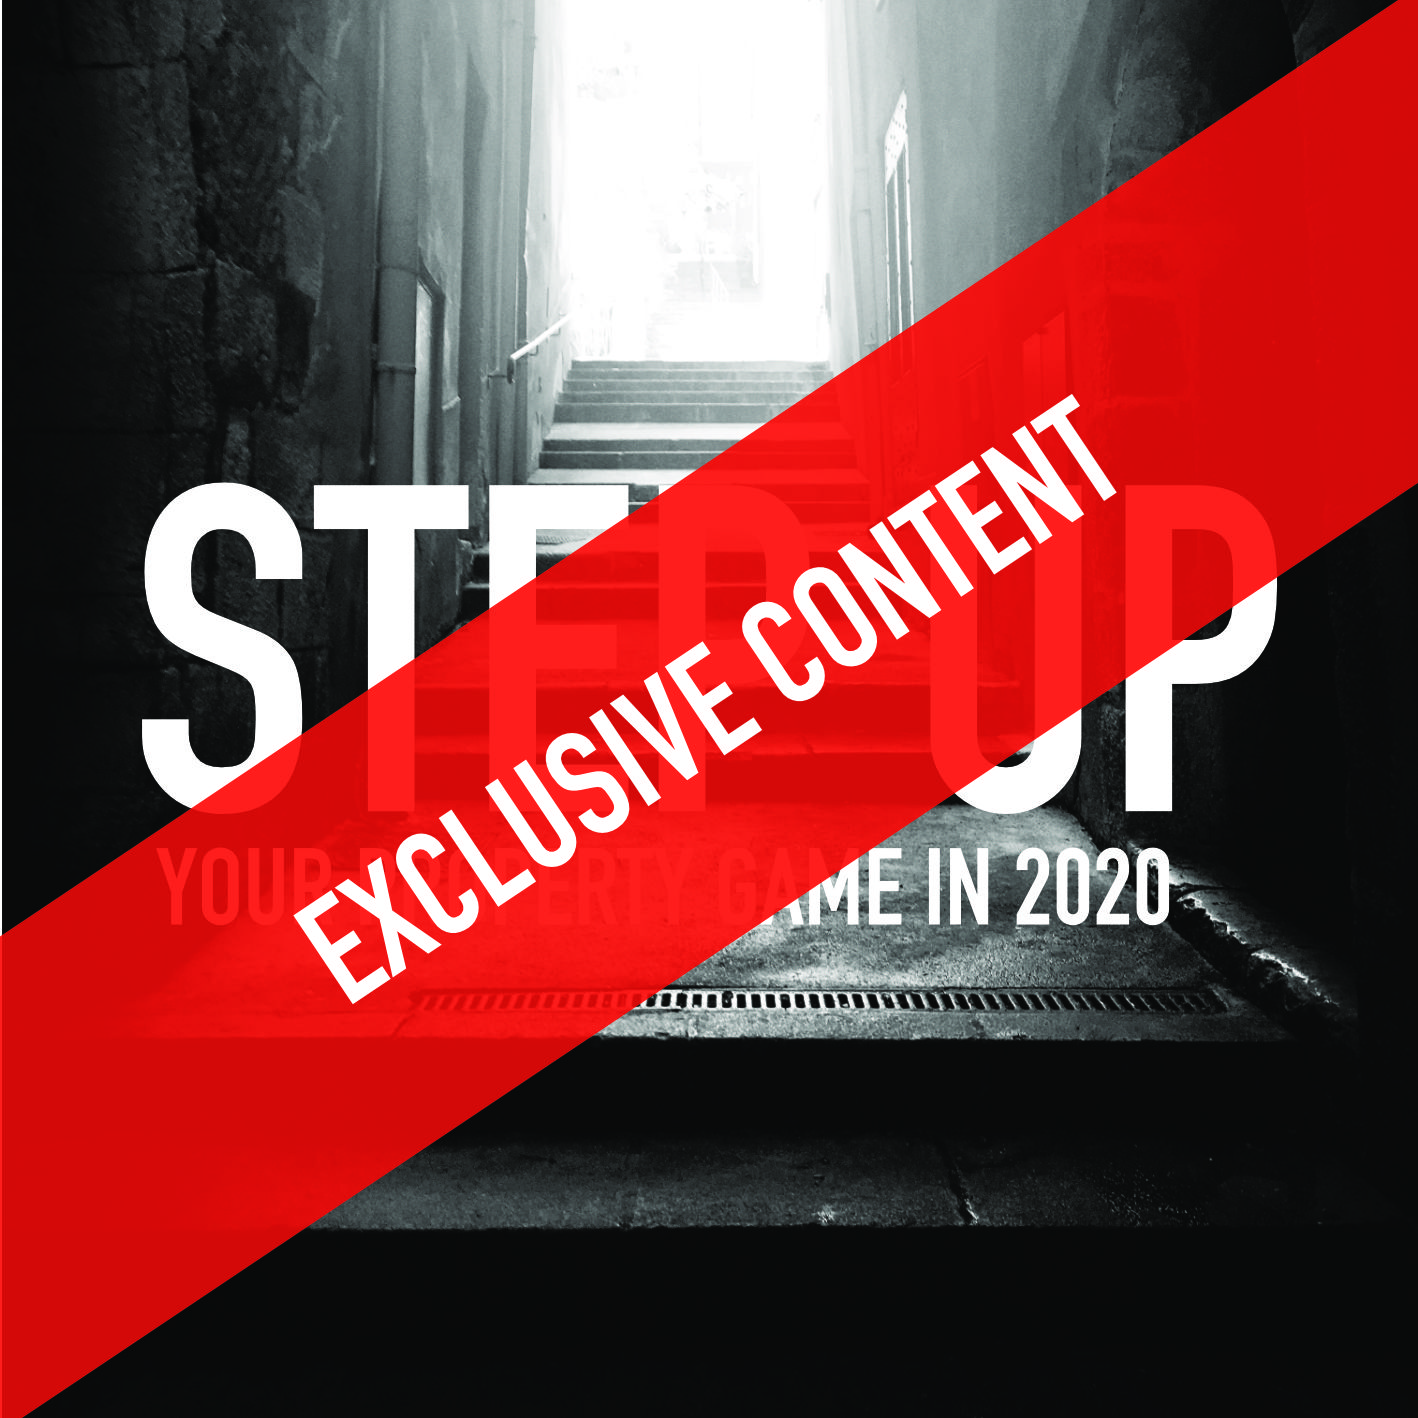 STEP UP Seminar EXCLUSIVE Download